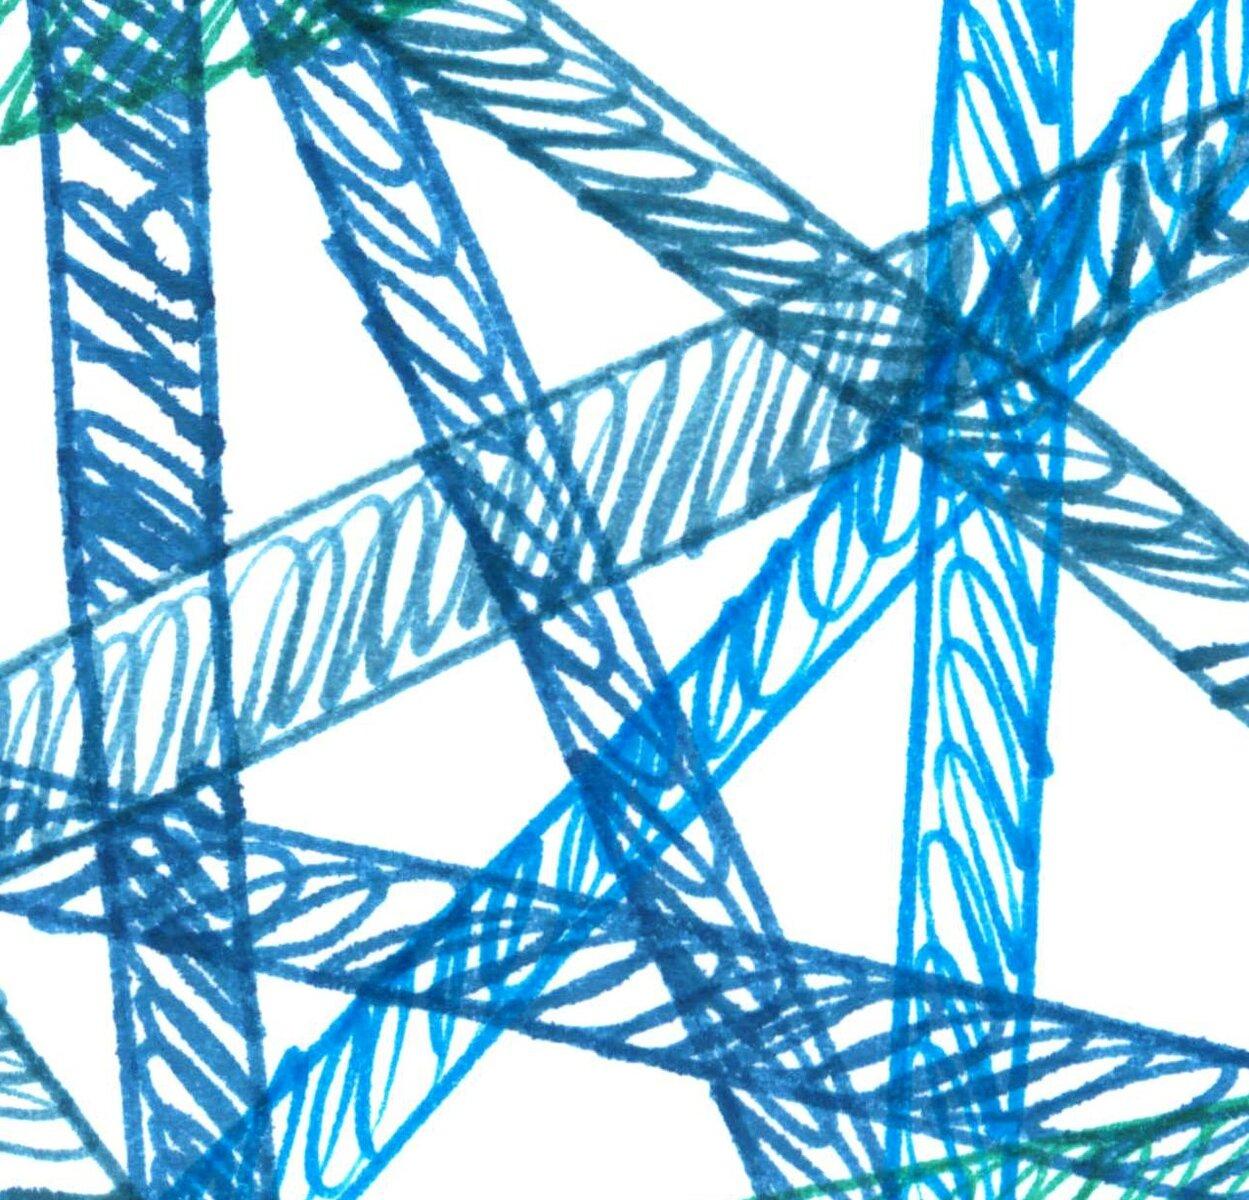 00-Blue.jpg